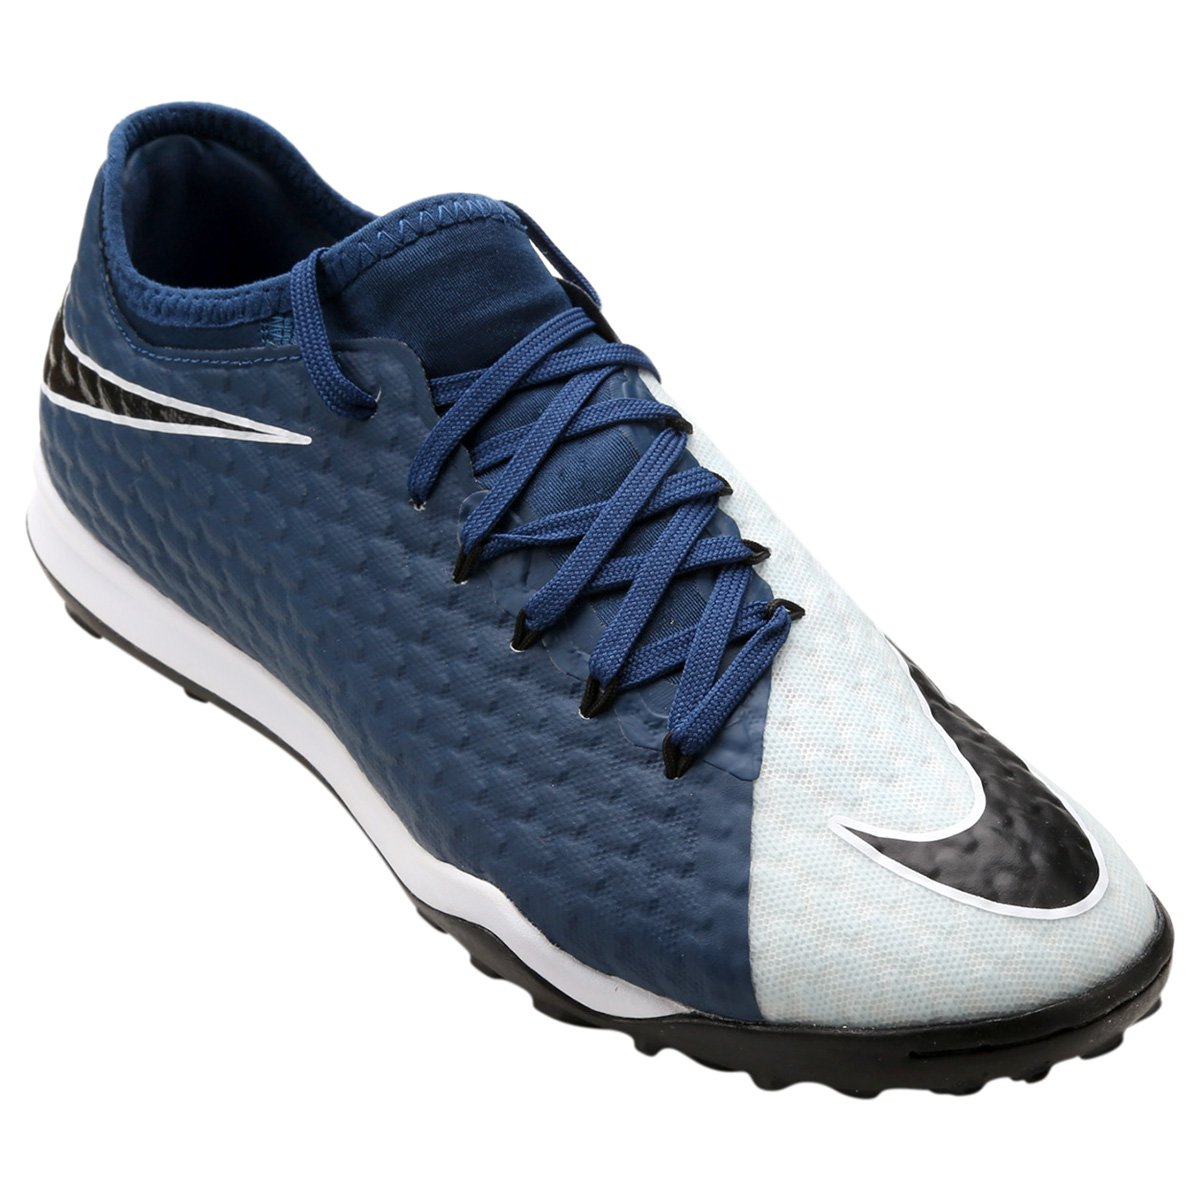 ... latest fashion 0eefe 47a2c Chuteira Society Nike Hypervenom Finale 2 TF  Masculina .. ... f4692a3c5f2bd